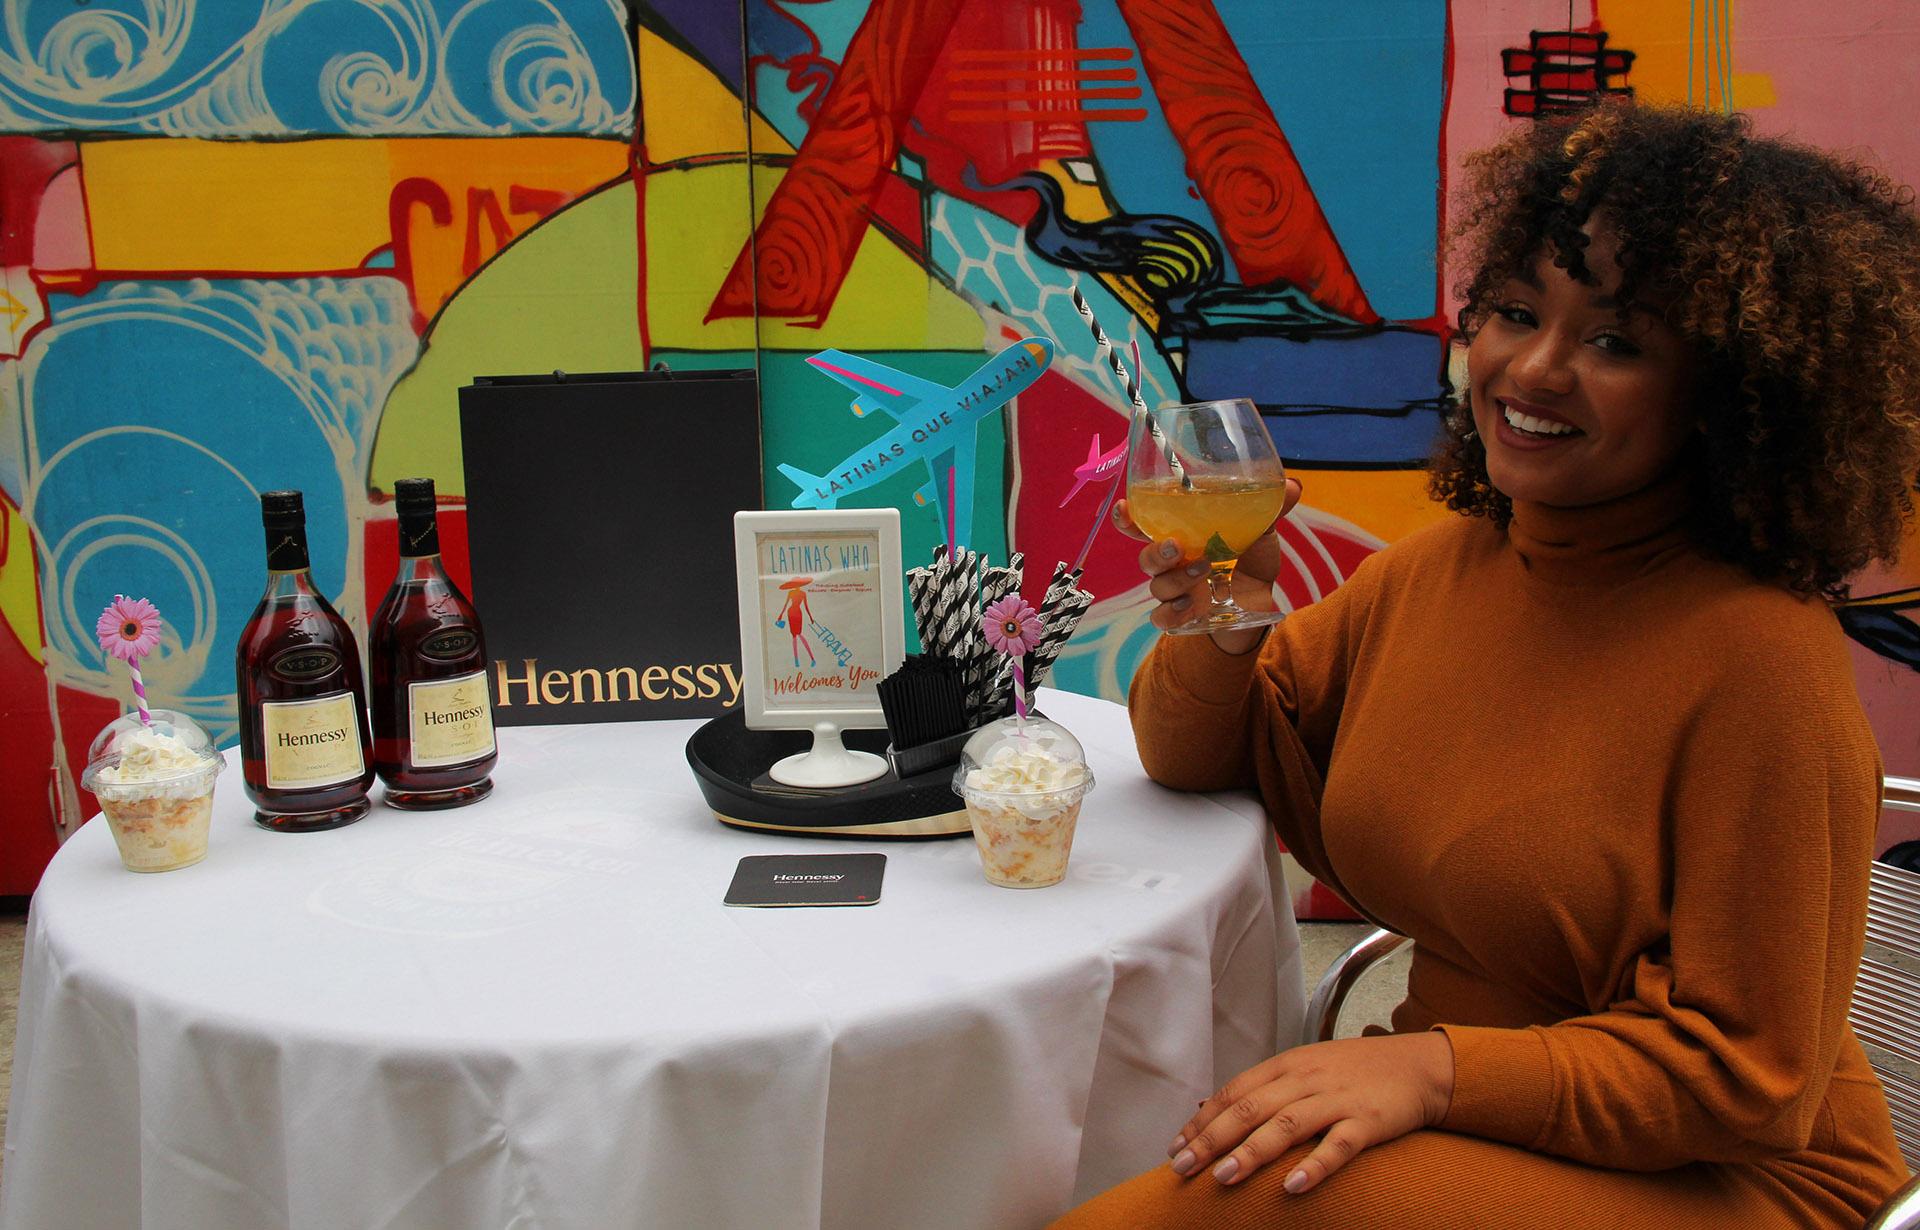 Valerie Lora - Hennessy - Latinas Who Travel